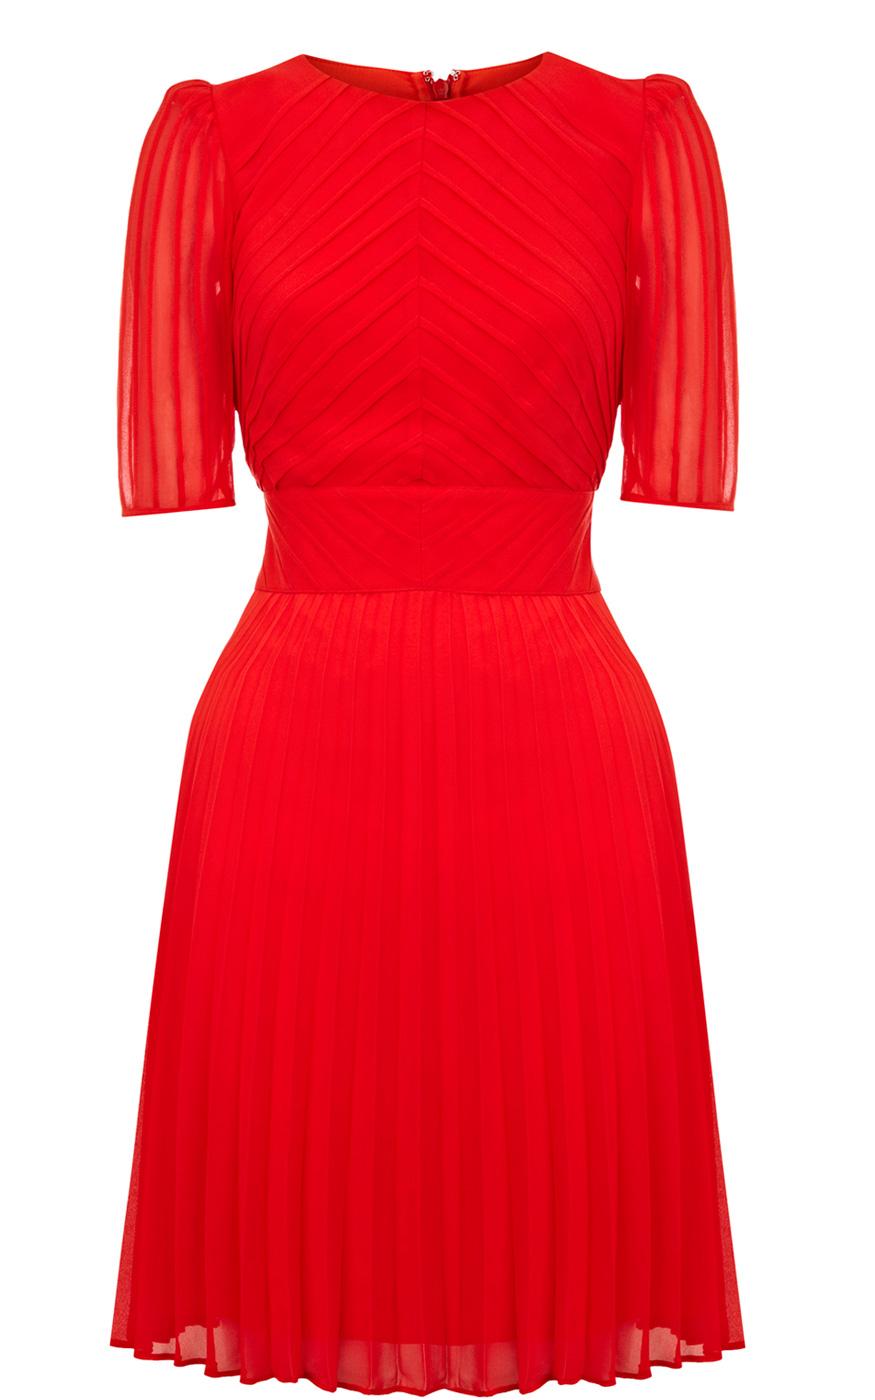 Karen Millen Red Pintuck Cute Dress Womens 758 1 - آداب میزبانی و میهمانی در ضیافت شب یلدا بلندترین شب سال